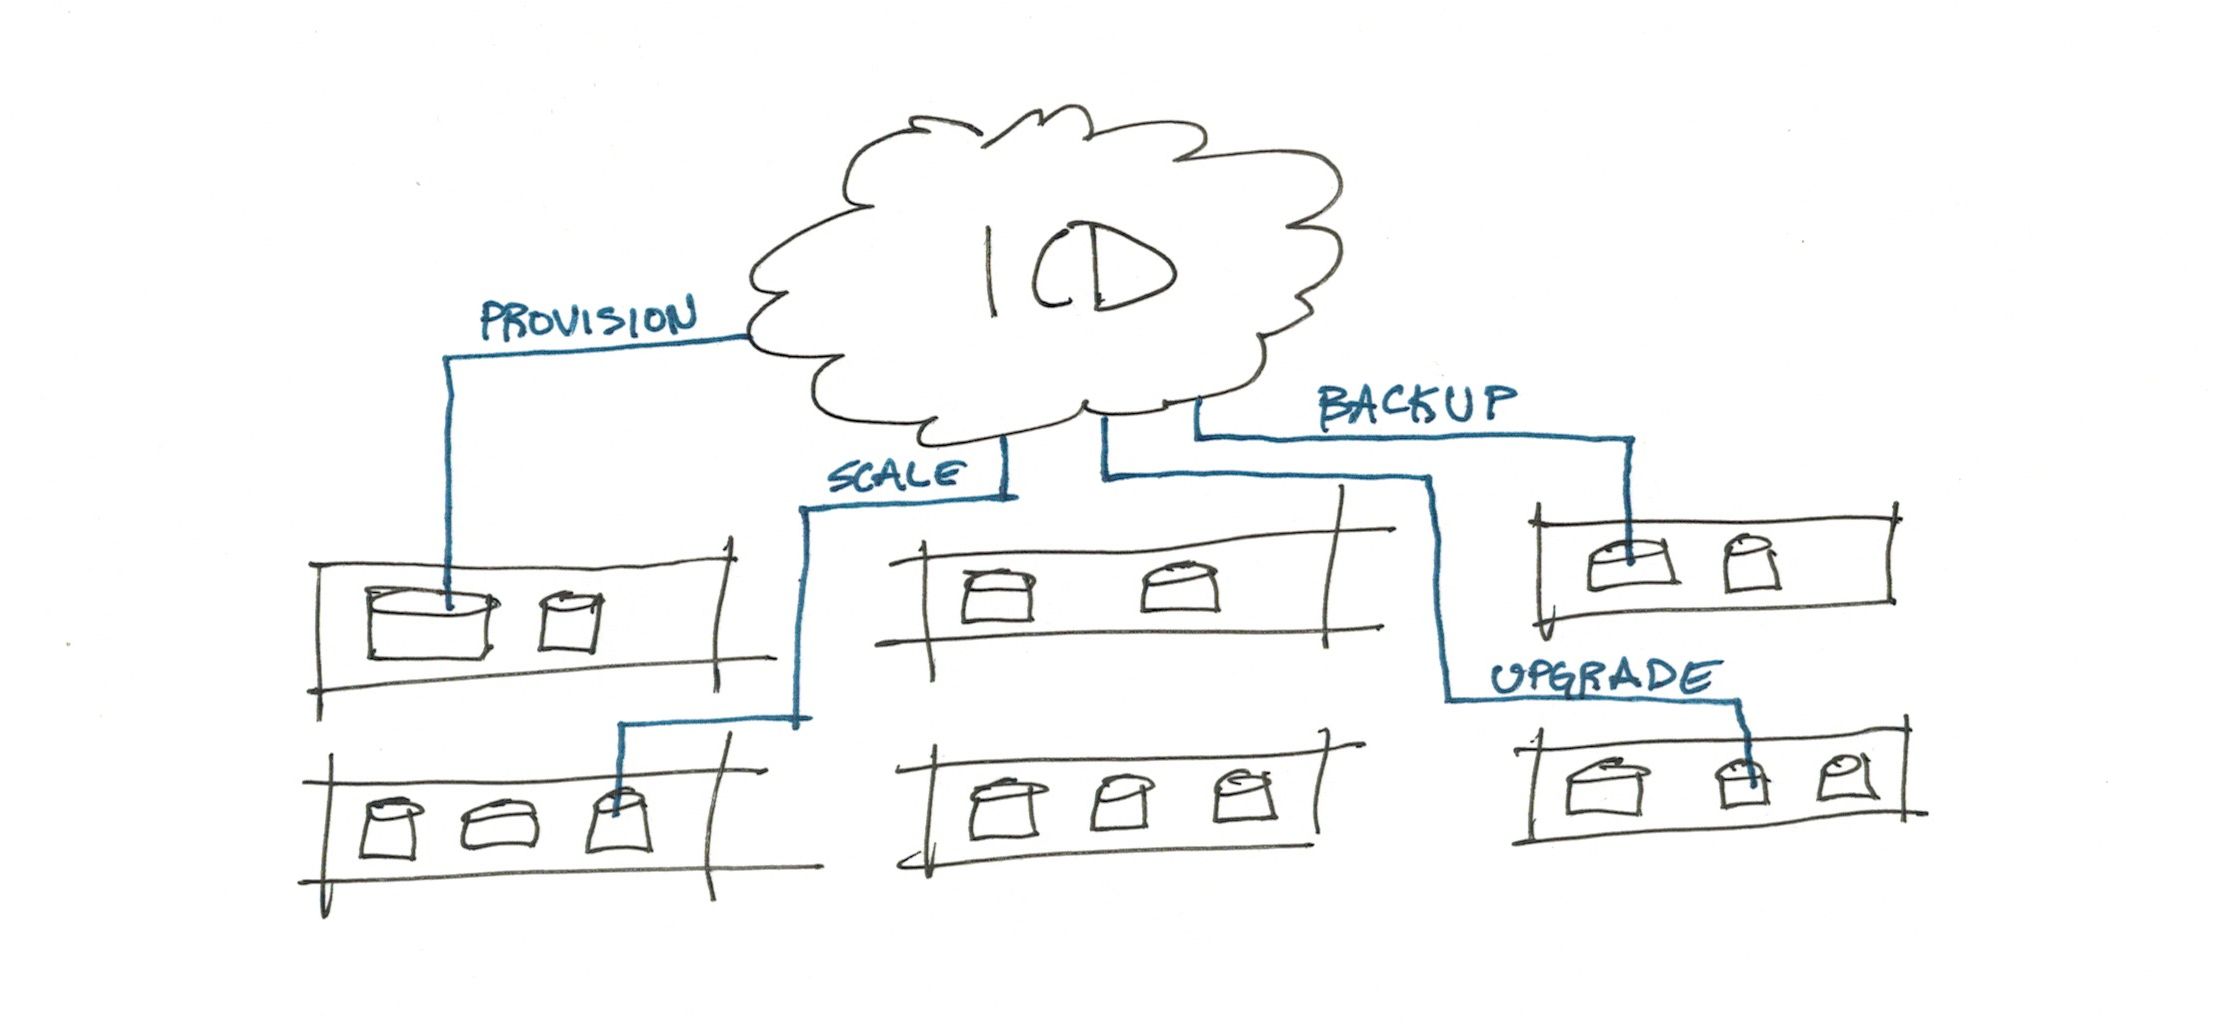 icd-base-problem